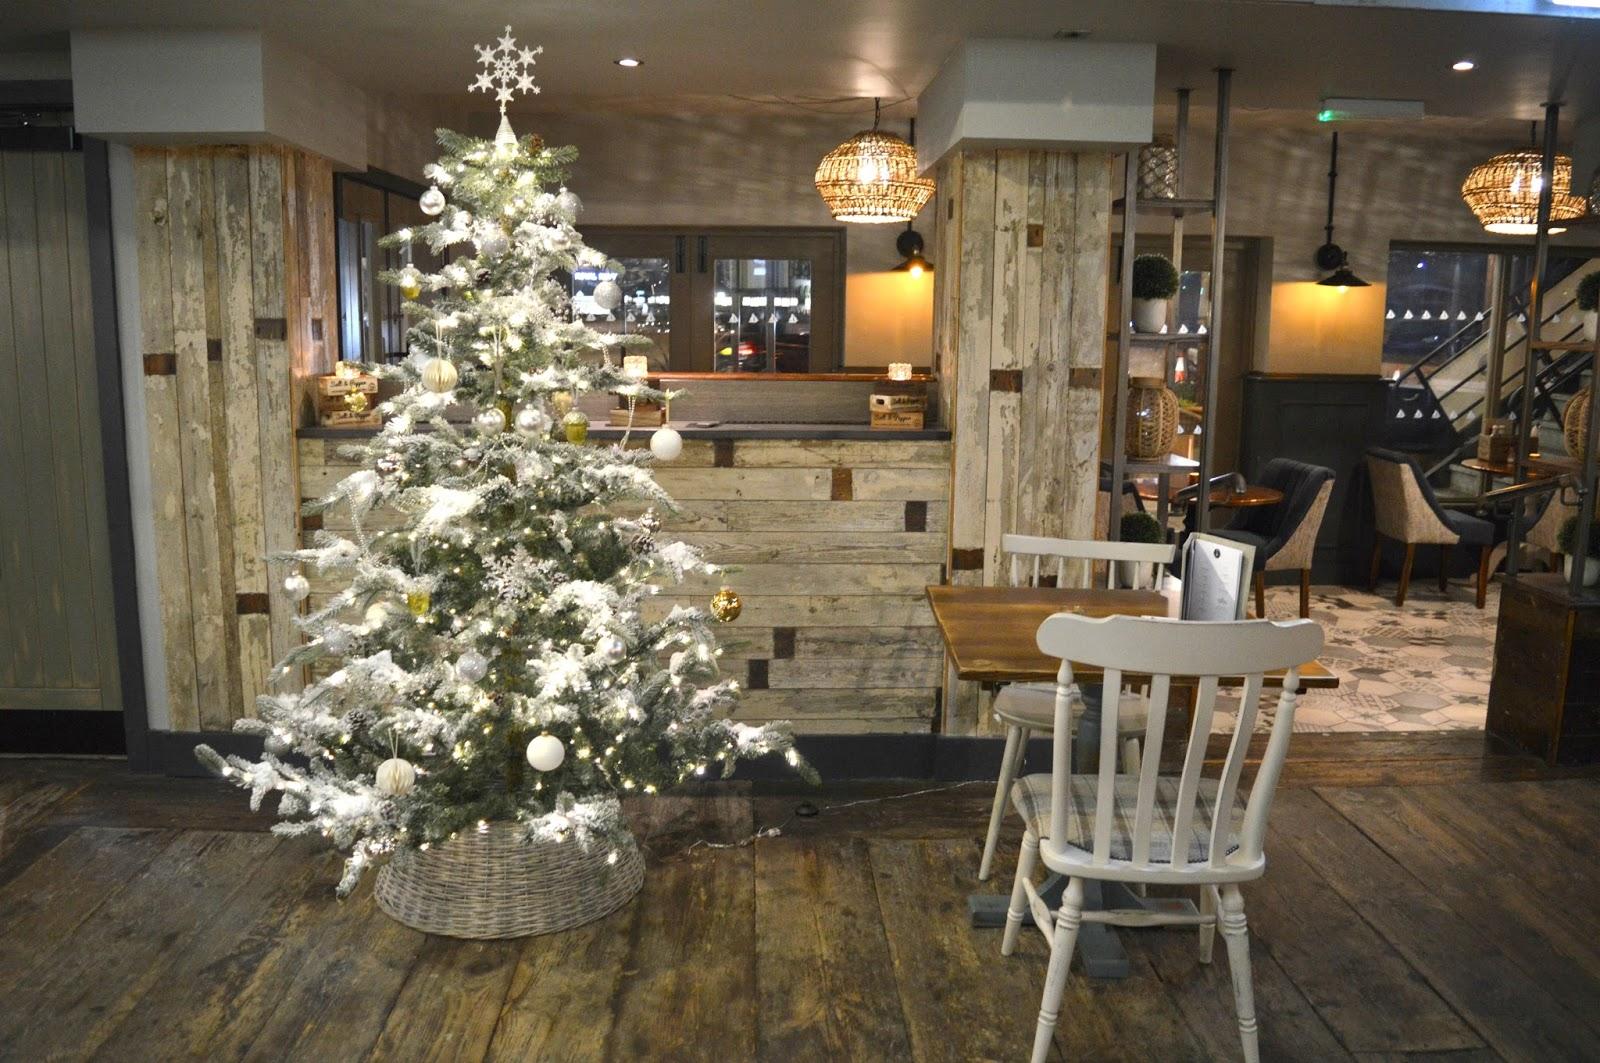 Christmas at the Jolly Fisherman on the Quayside - Christmas Tree